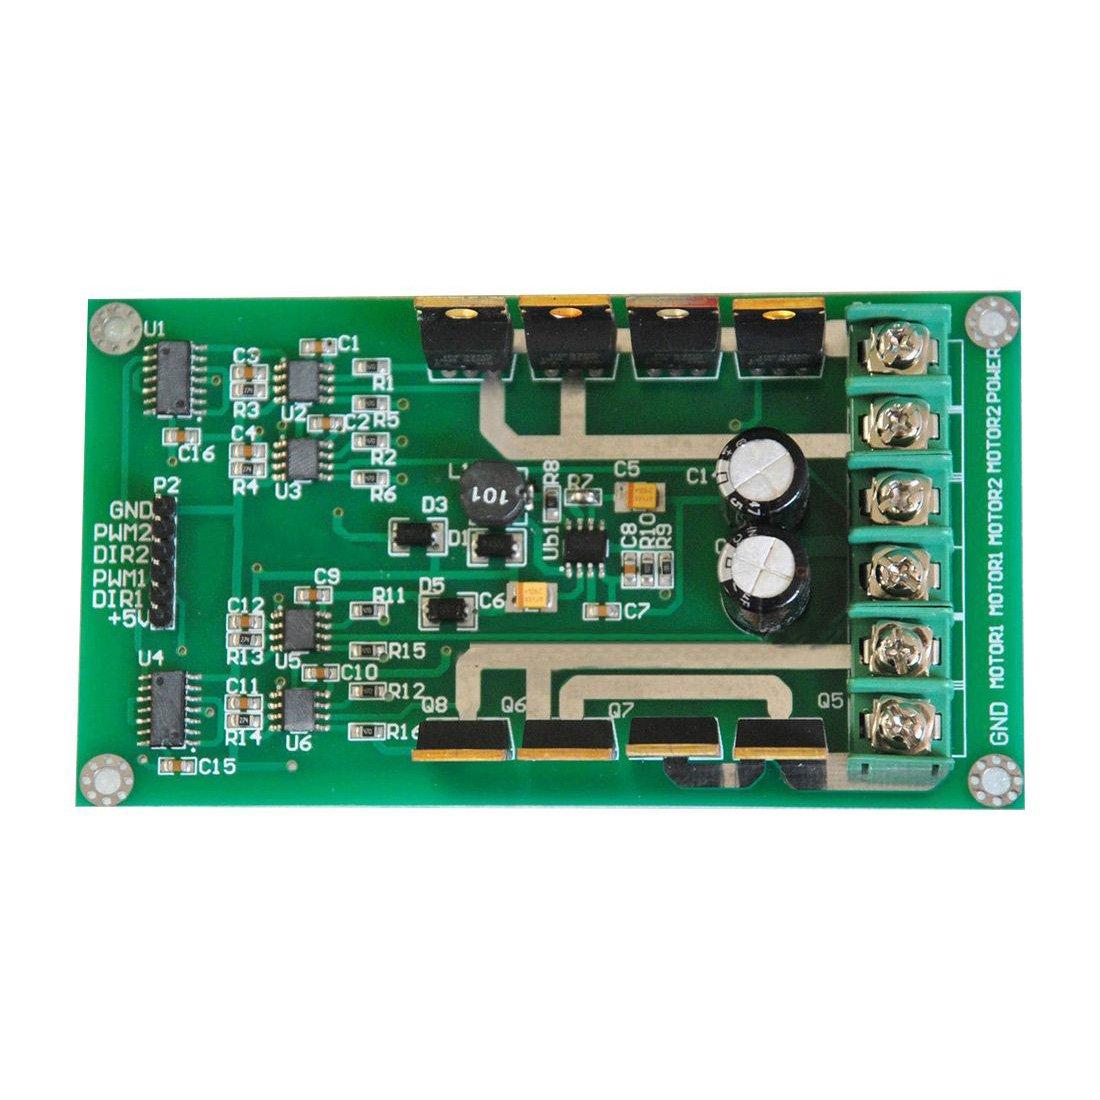 SODIAL(R) 3V-36V Dual Motor Driver Board Module H-bridge DC MOSFET IRF3205 15A Peak 30A